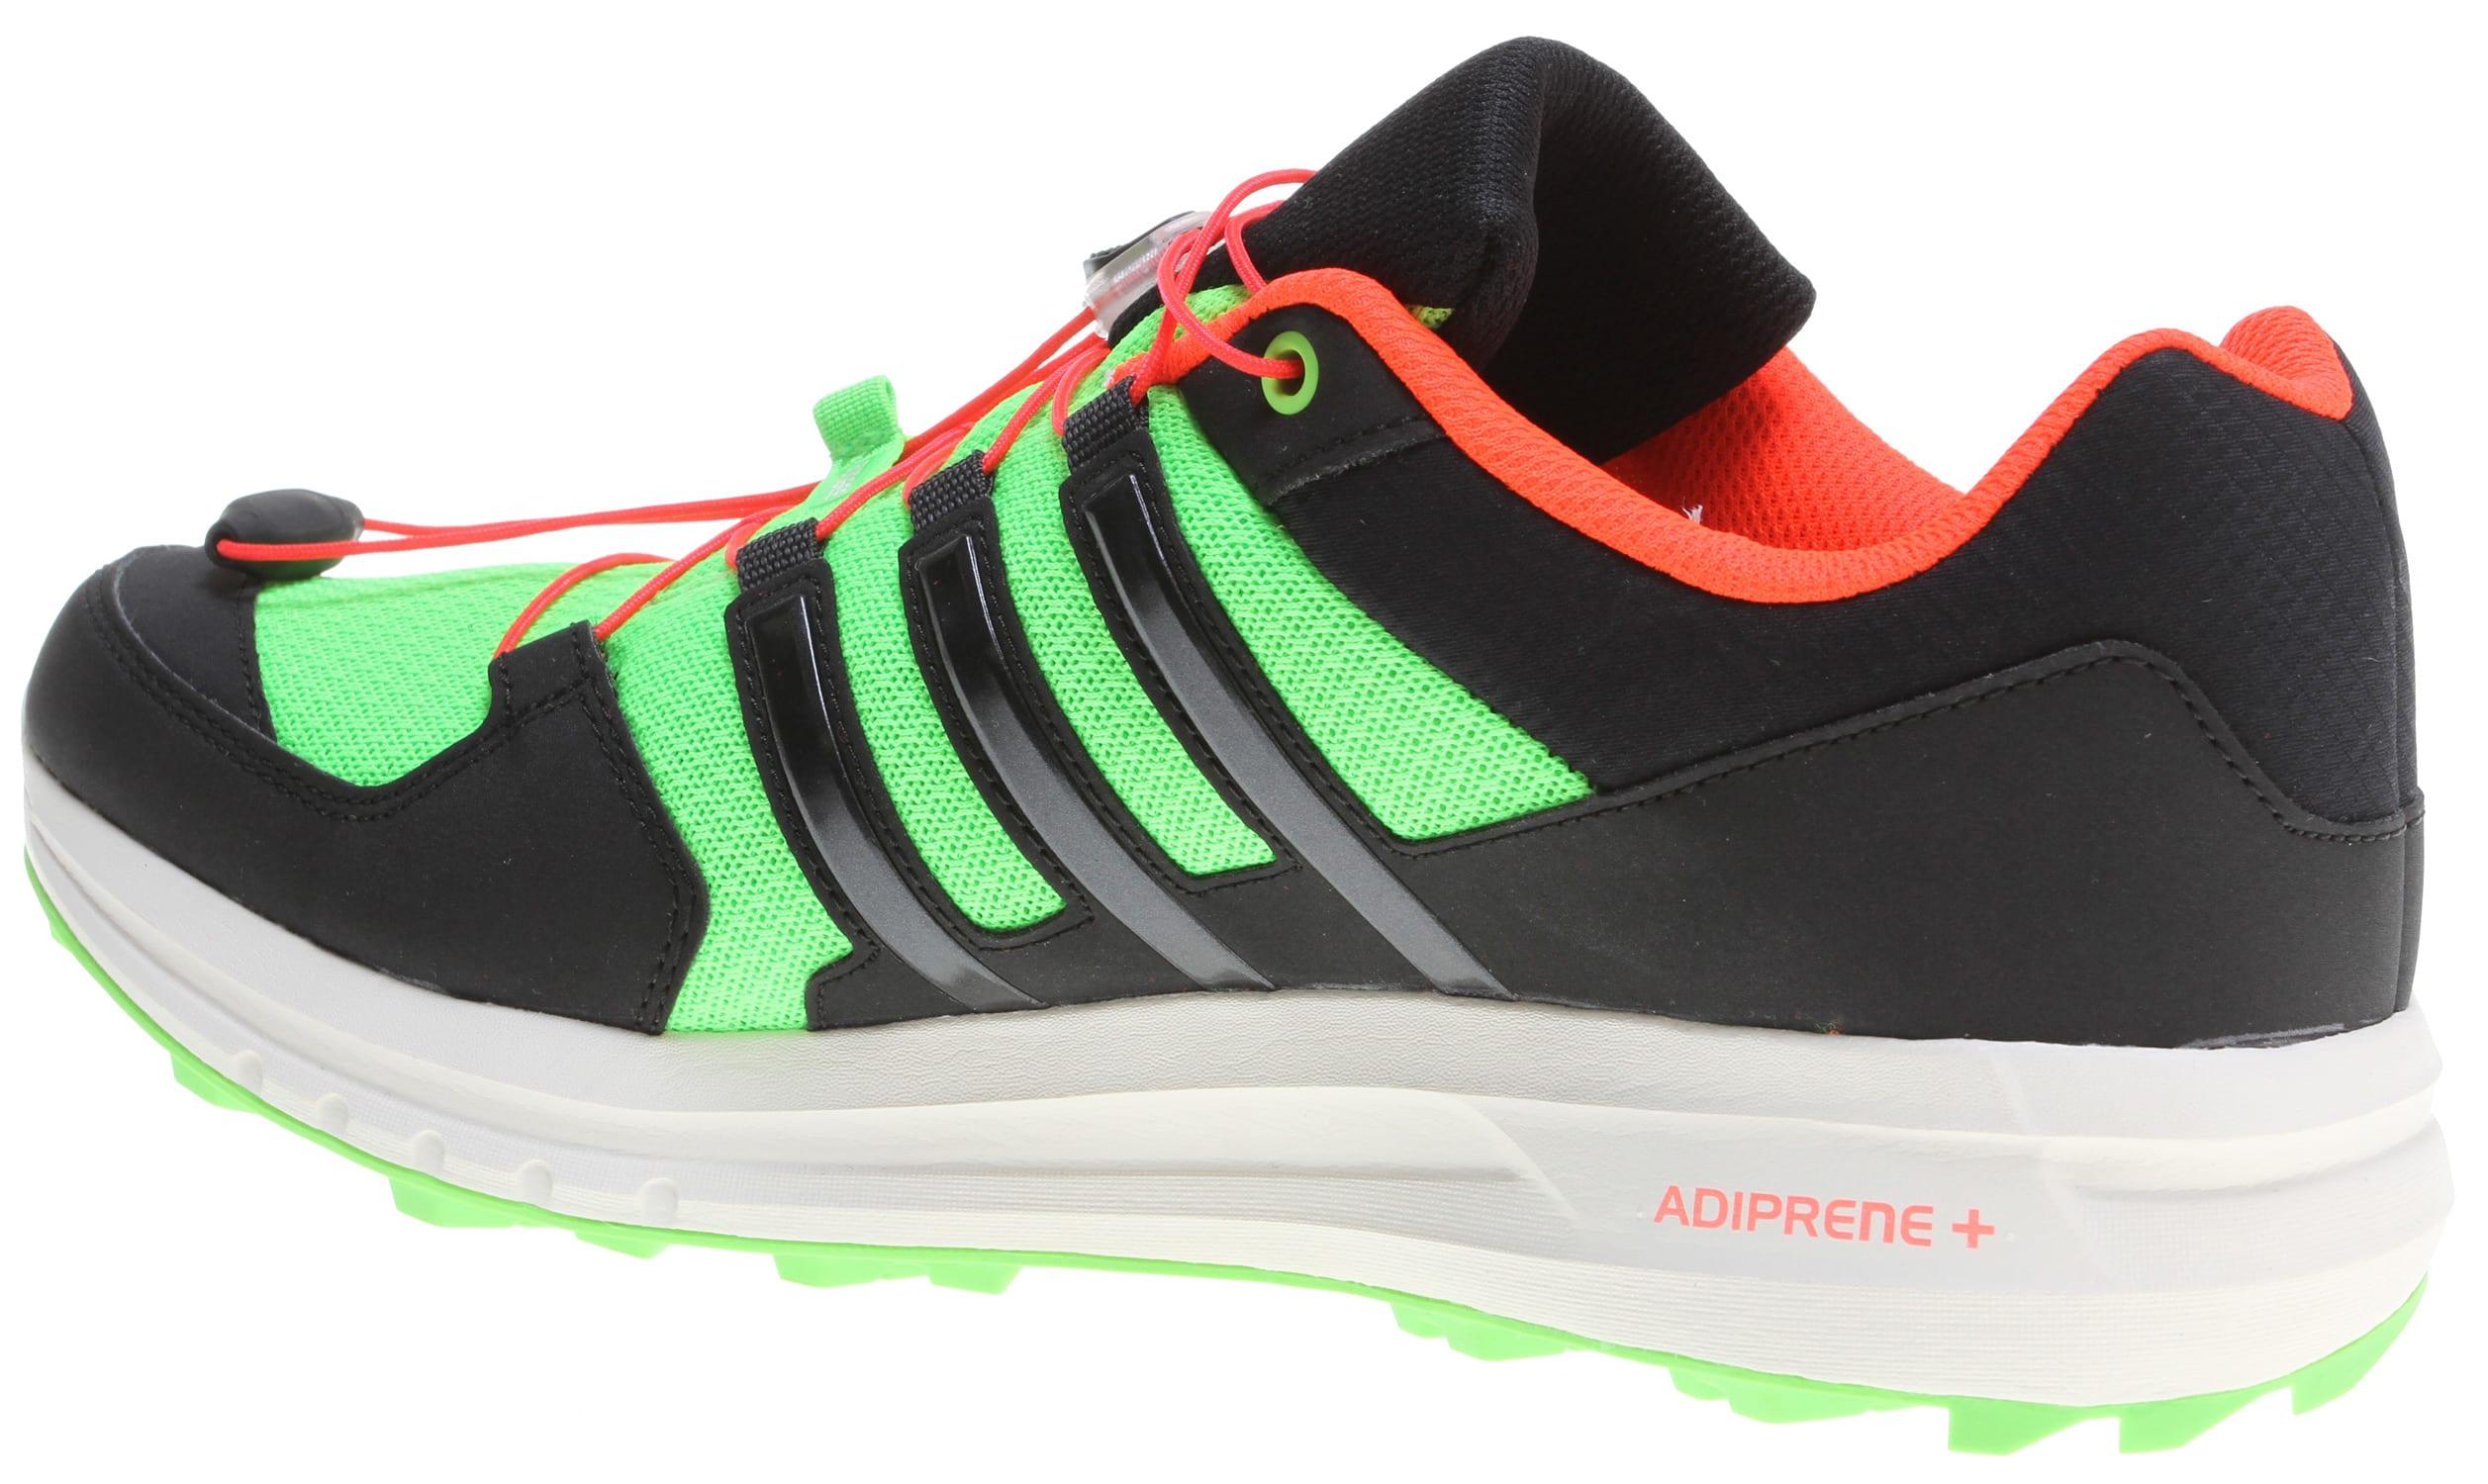 newest 3fcf5 abd86 Adidas Duramo Cross Trail Hiking Shoes - thumbnail 3